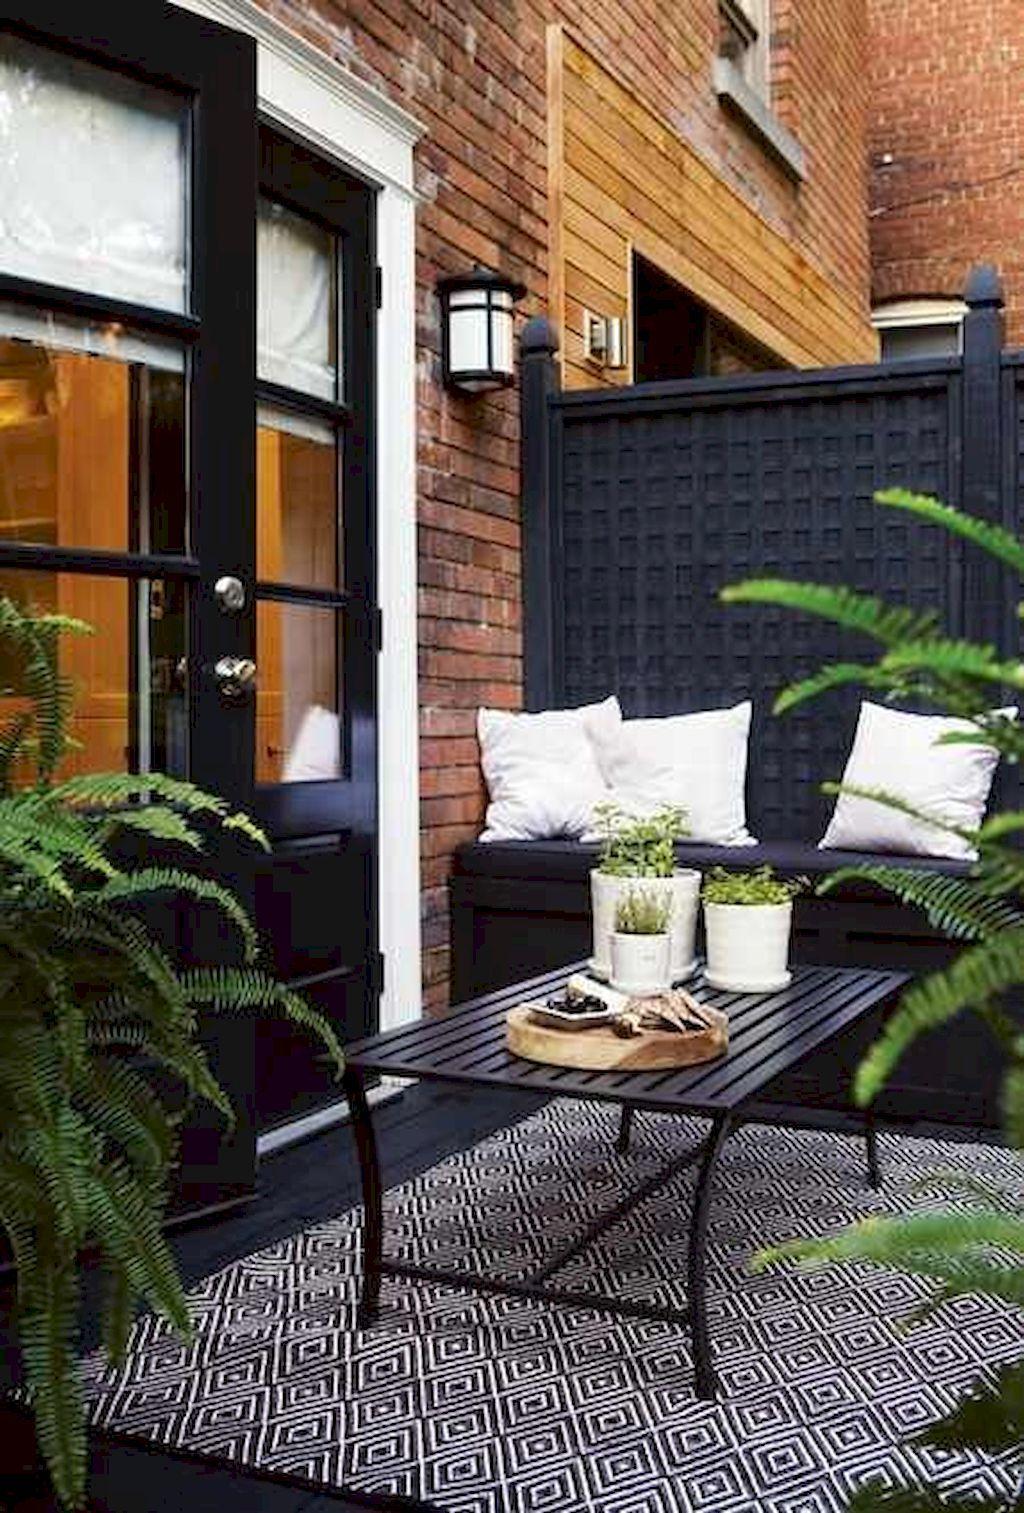 Awesome fabulous small patio ideas on a budget besideroom